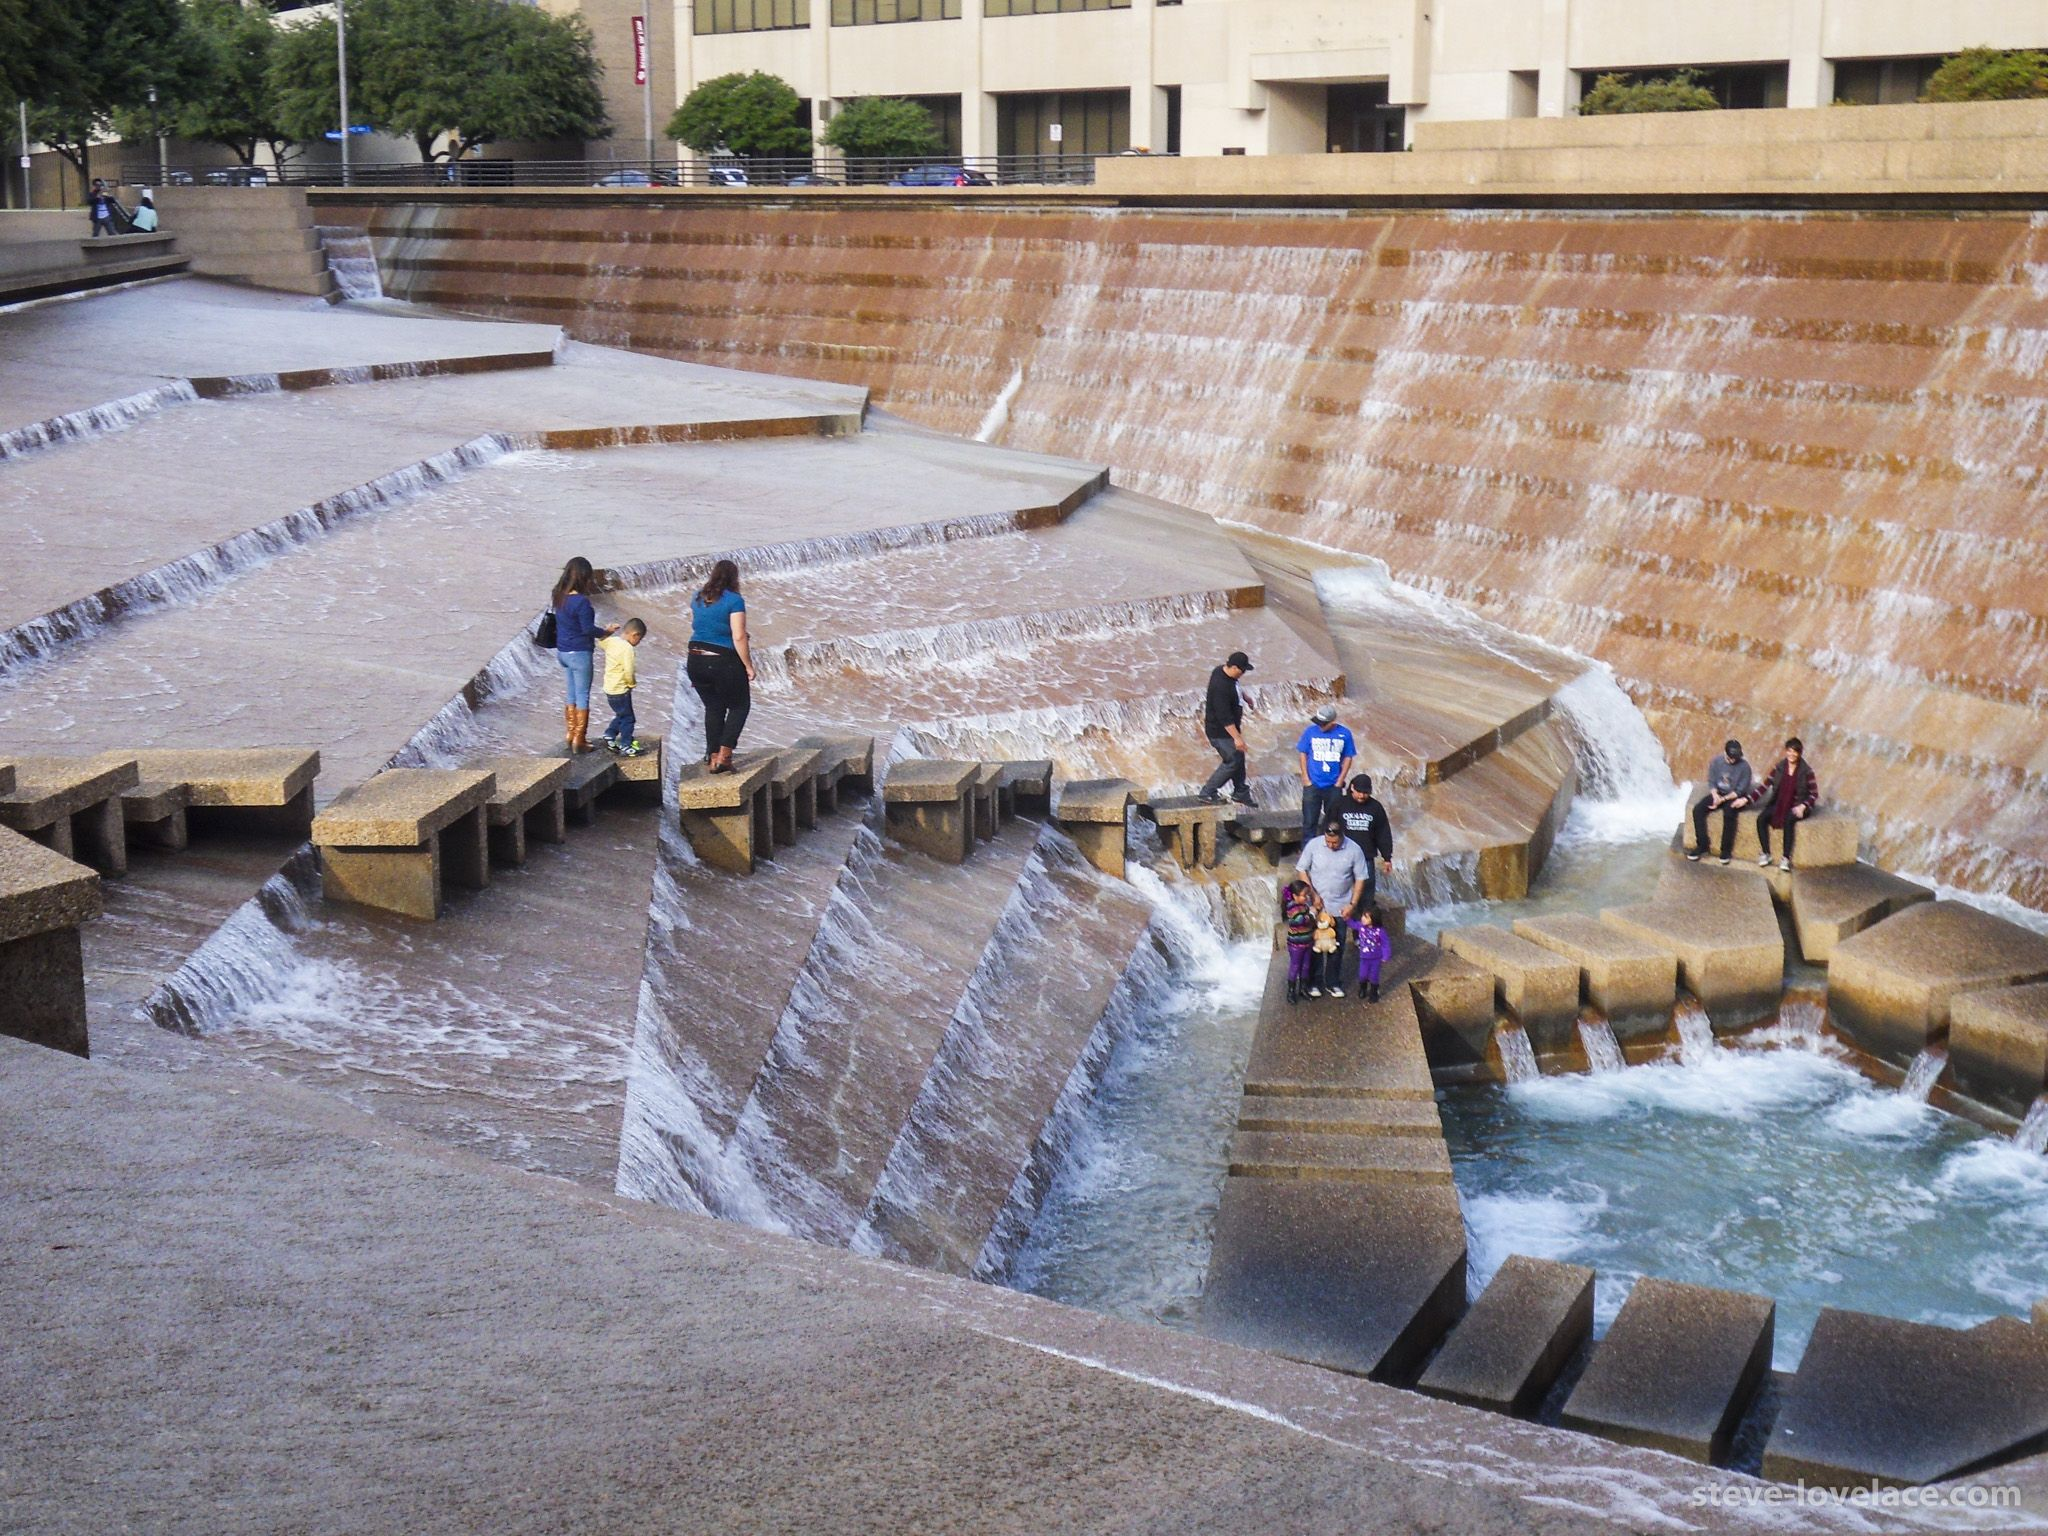 Philip Johnson Fort Worth Water Gardens, Fort Worth, Texas